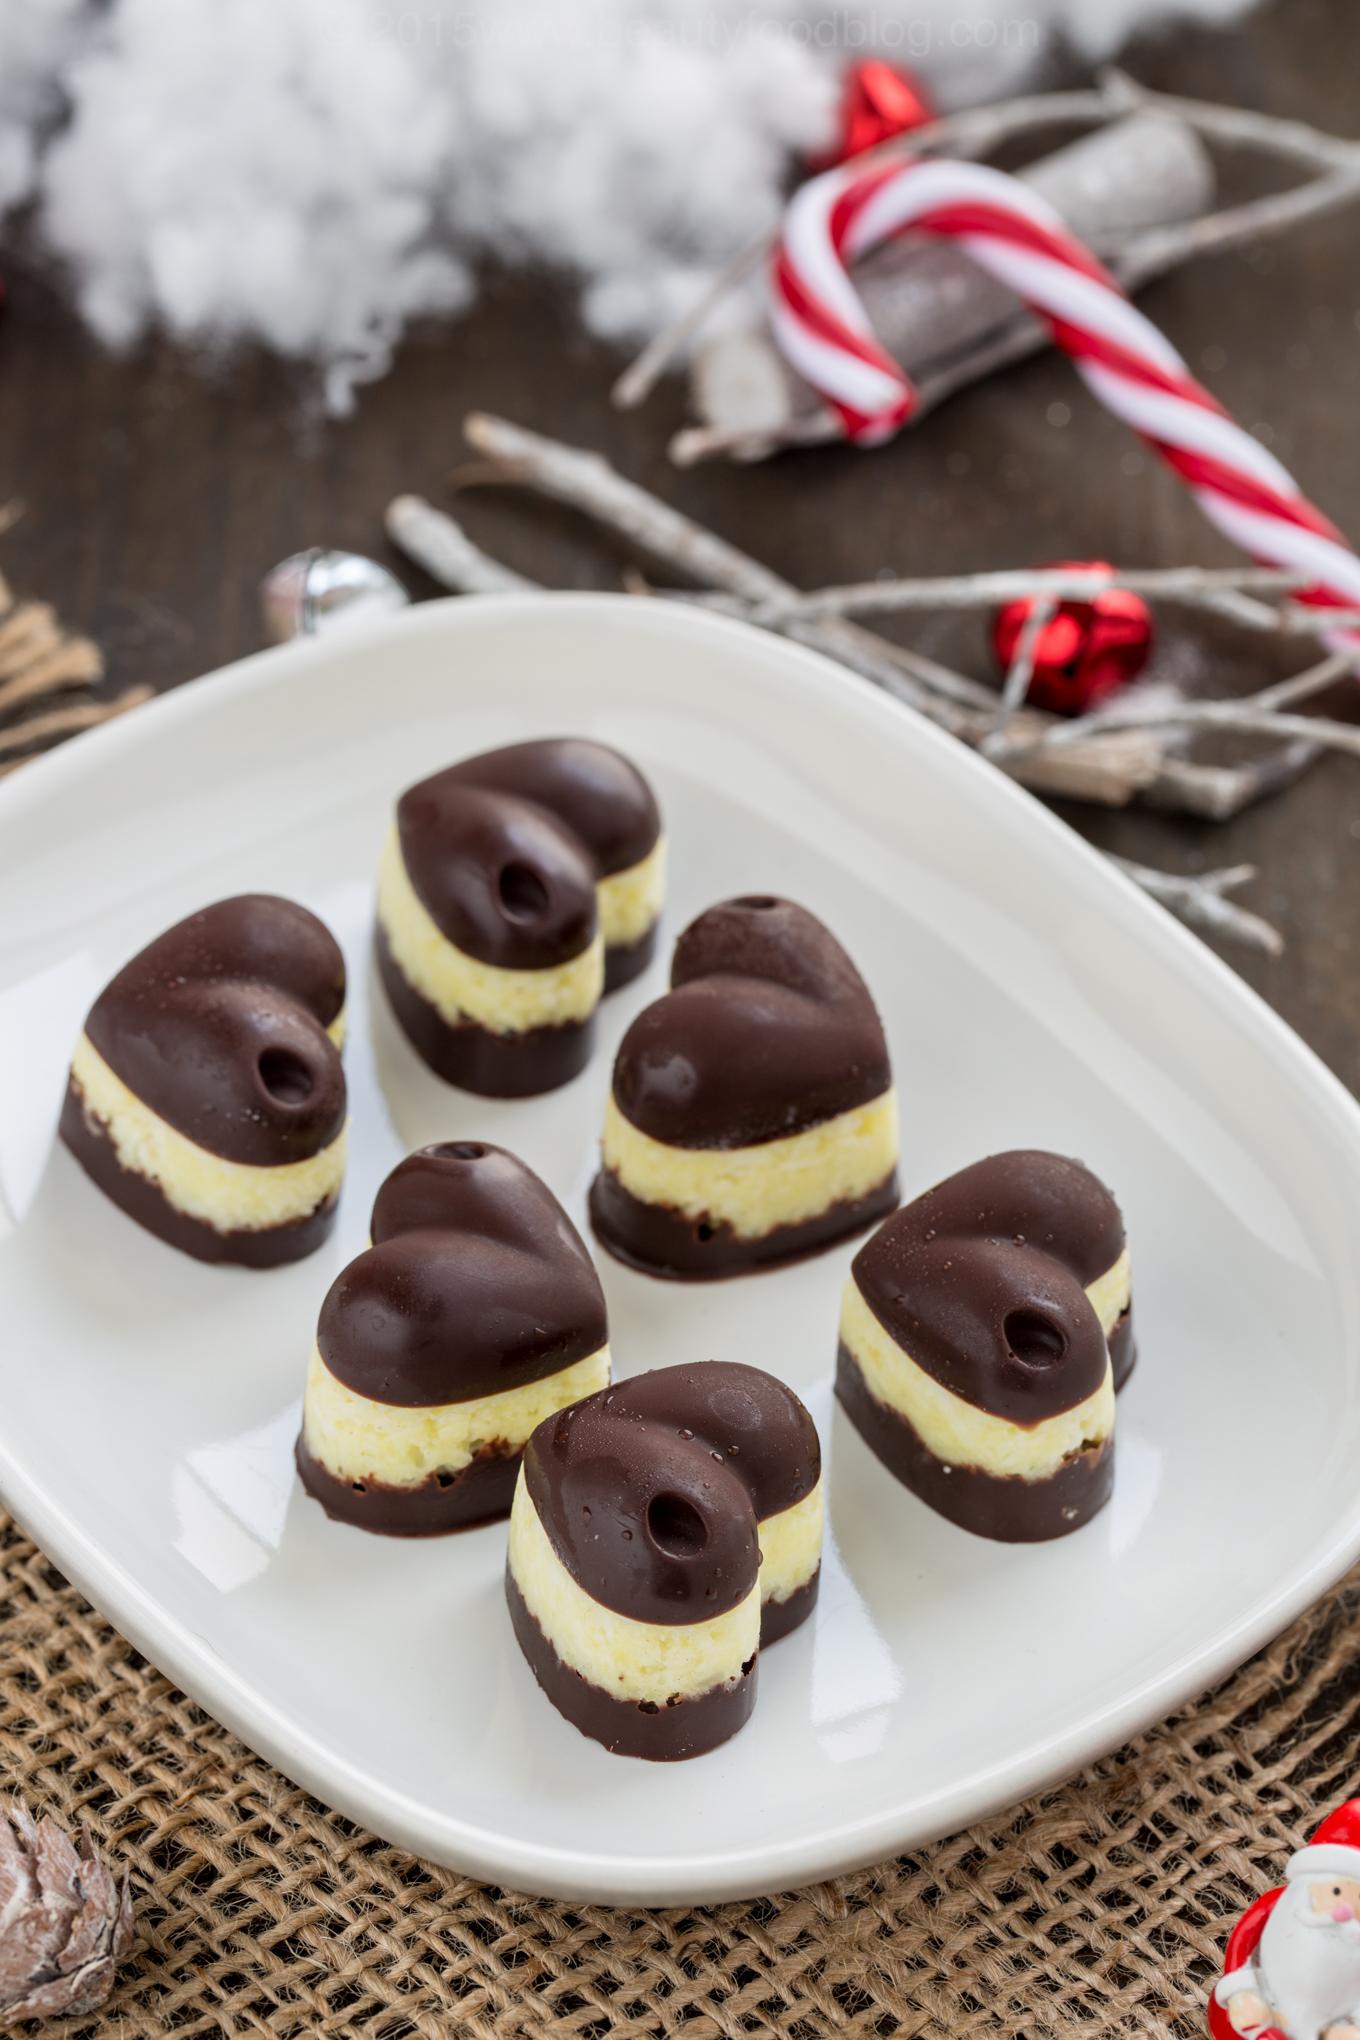 Vegan #chocolate #coconut pineapple truffles glutenfree ! cioccolatini al cocco e ananas vegan senza glutine senza burro #natale